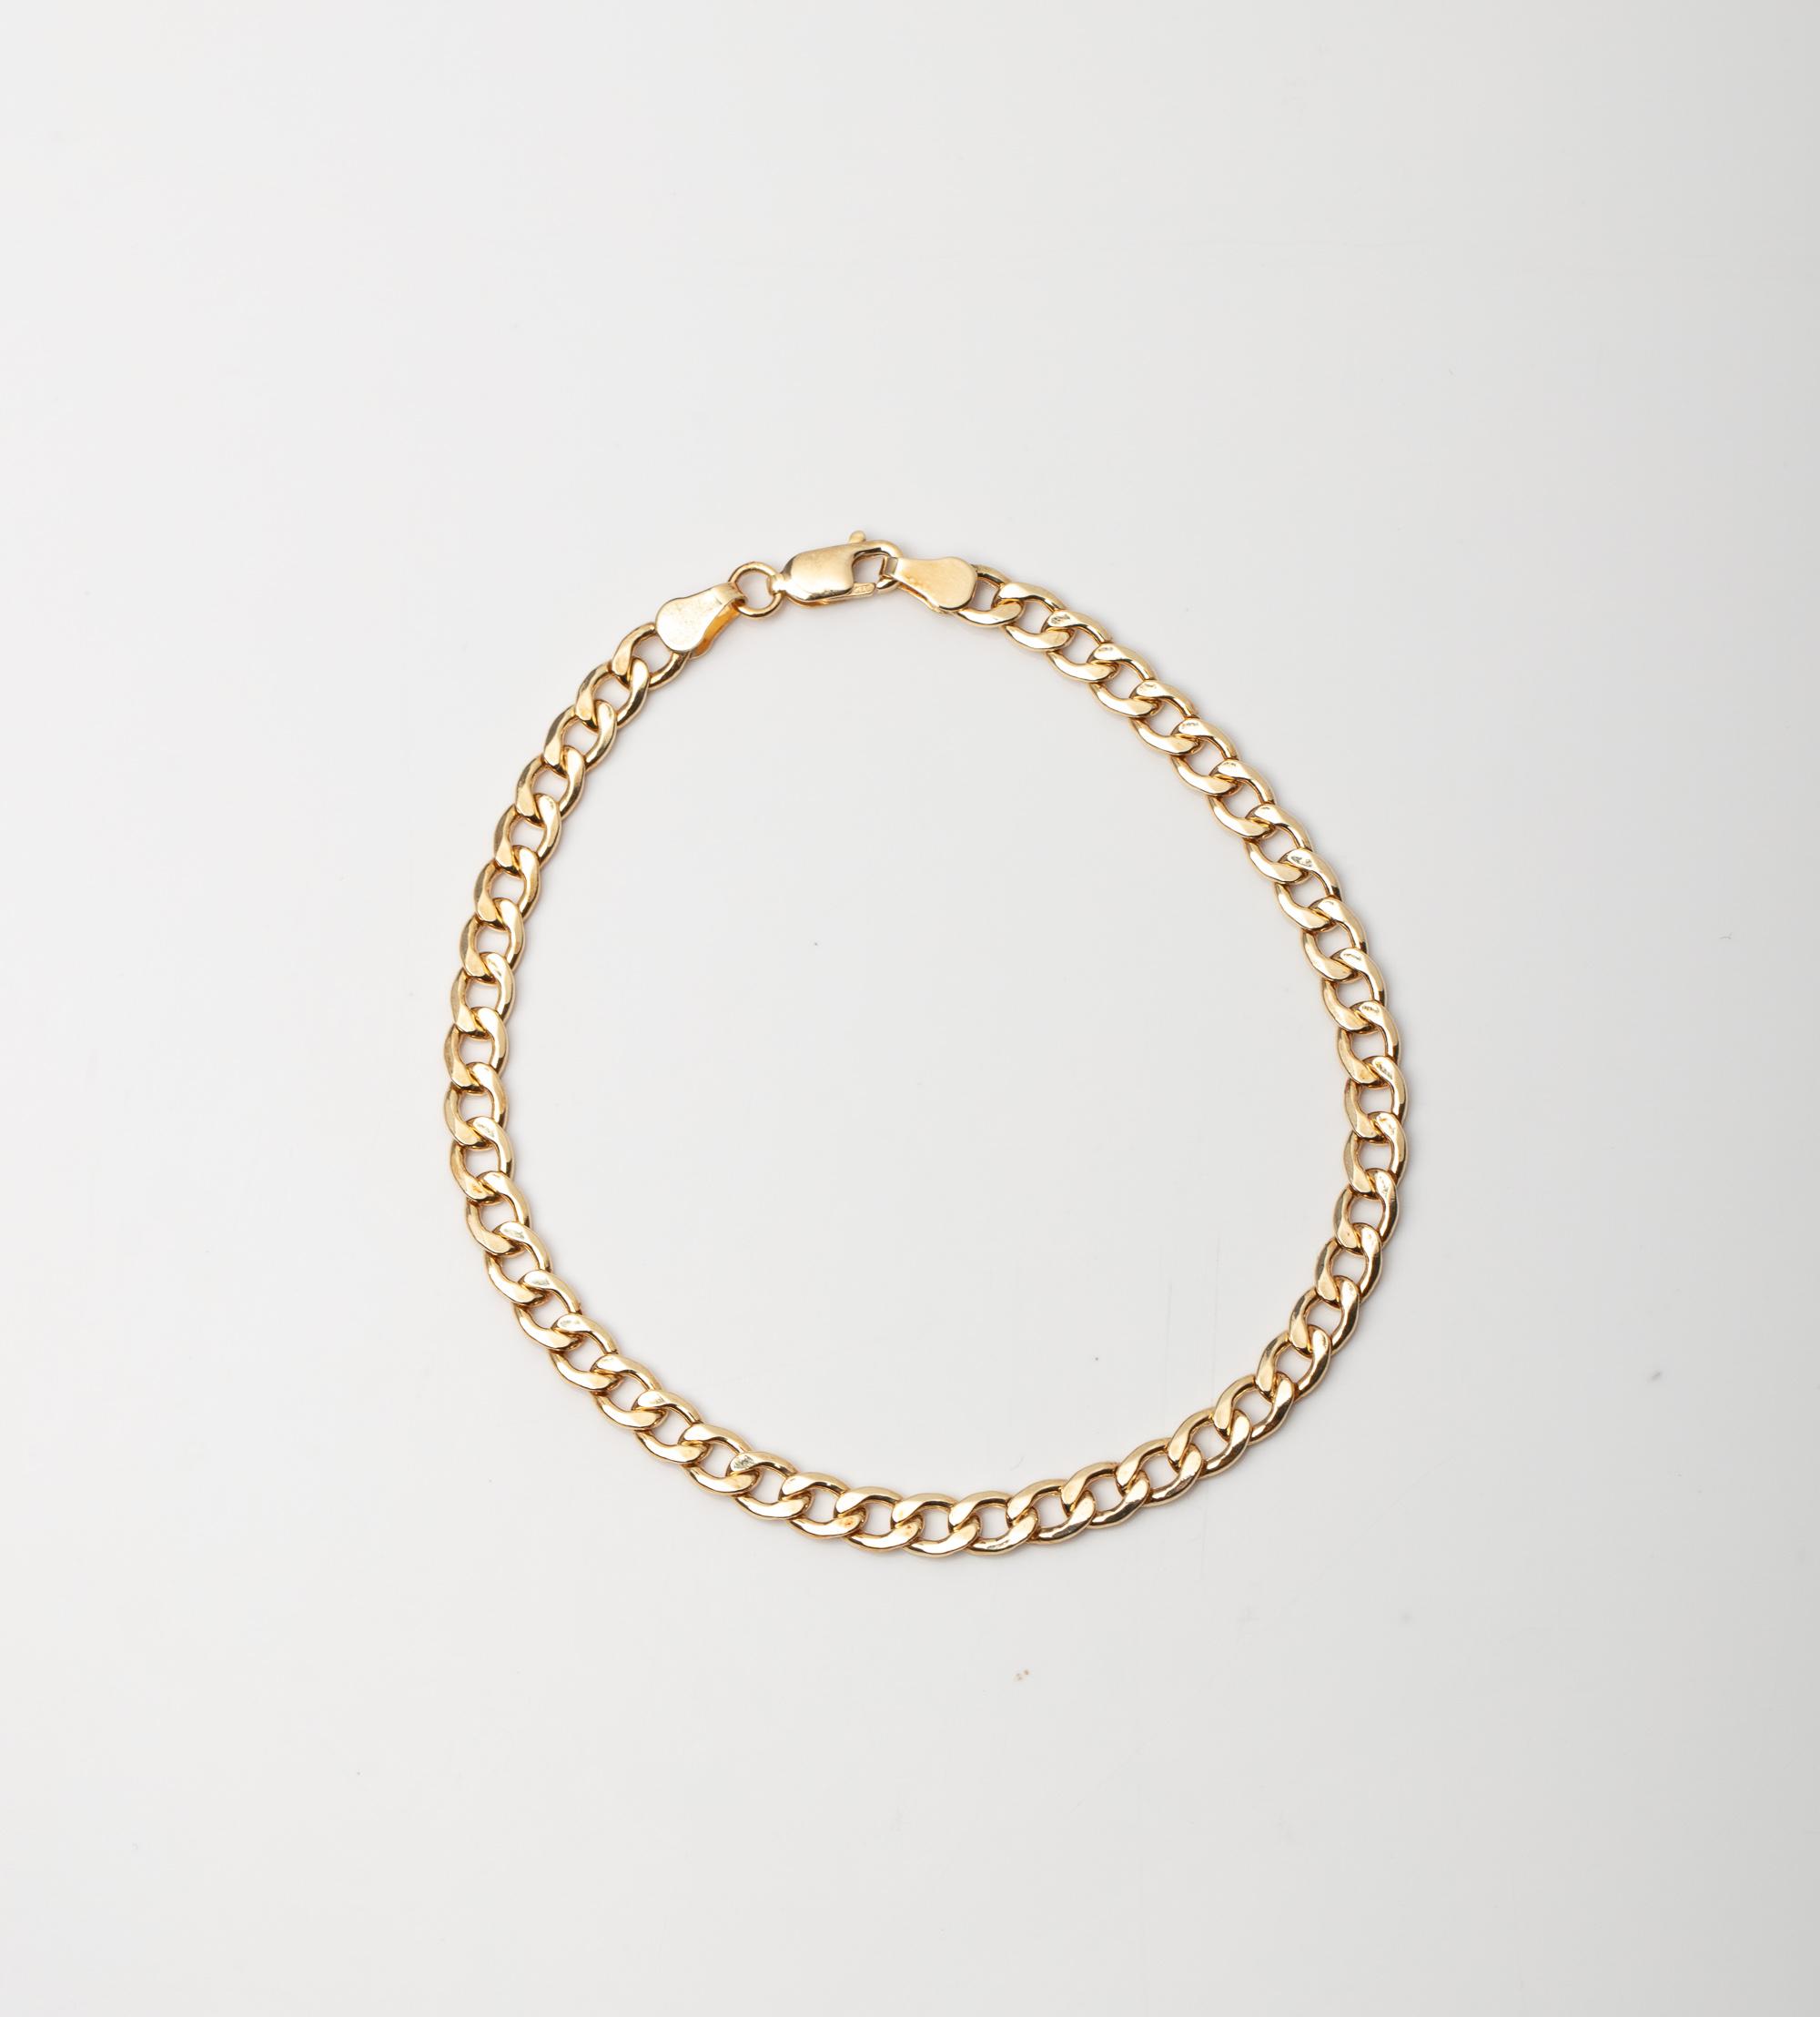 A 9CT GOLD & SILVER BONDED CURB BRACELET